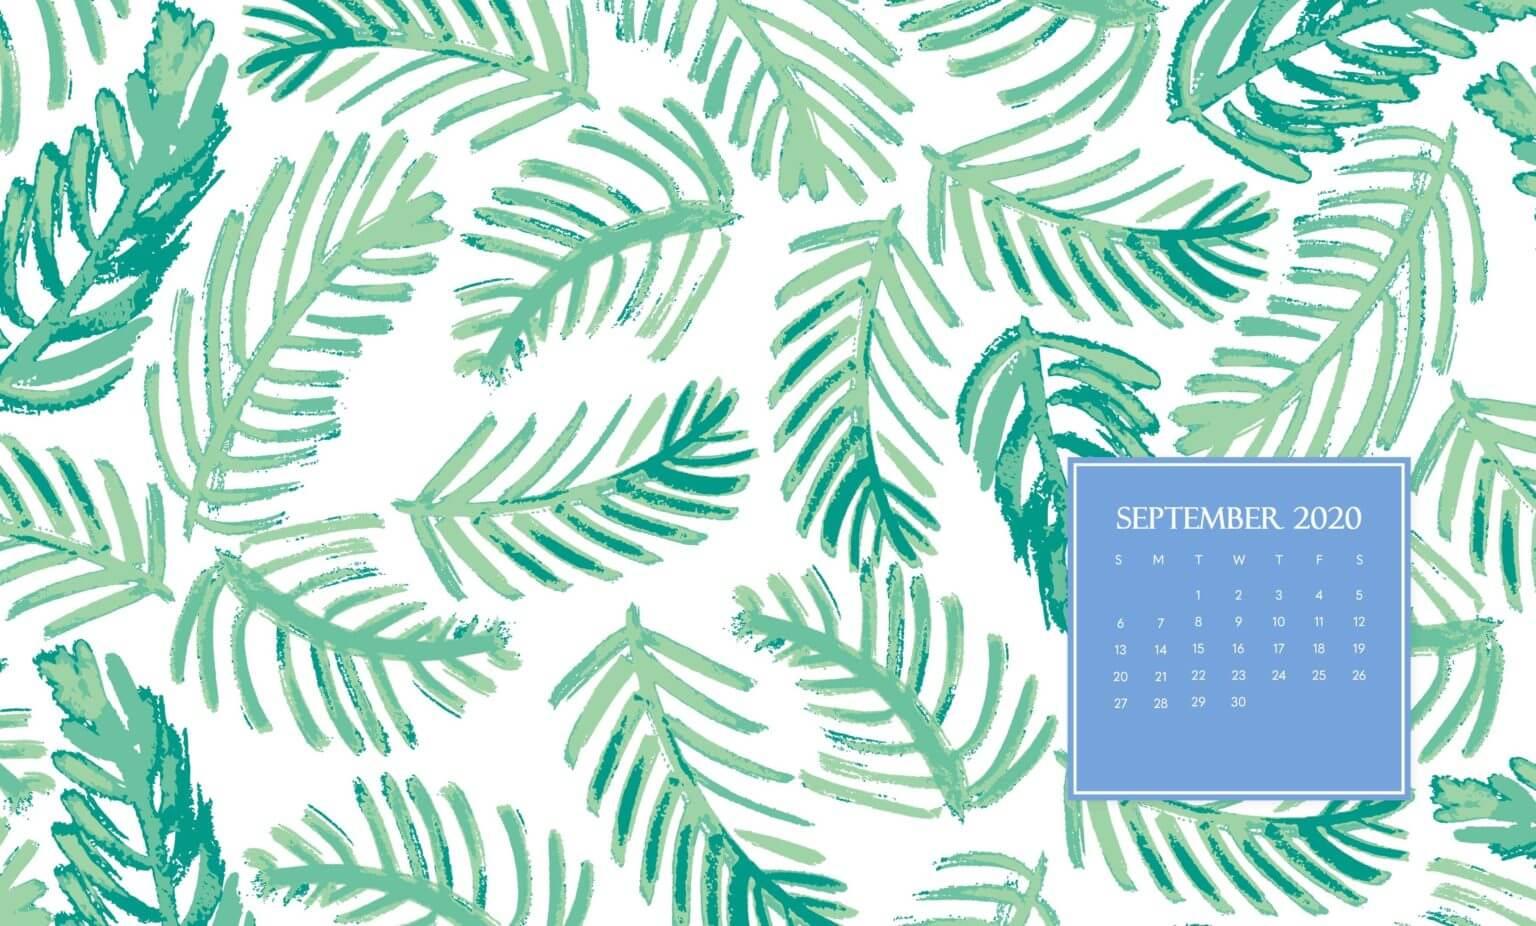 September 2020 Wallpaper Calendar